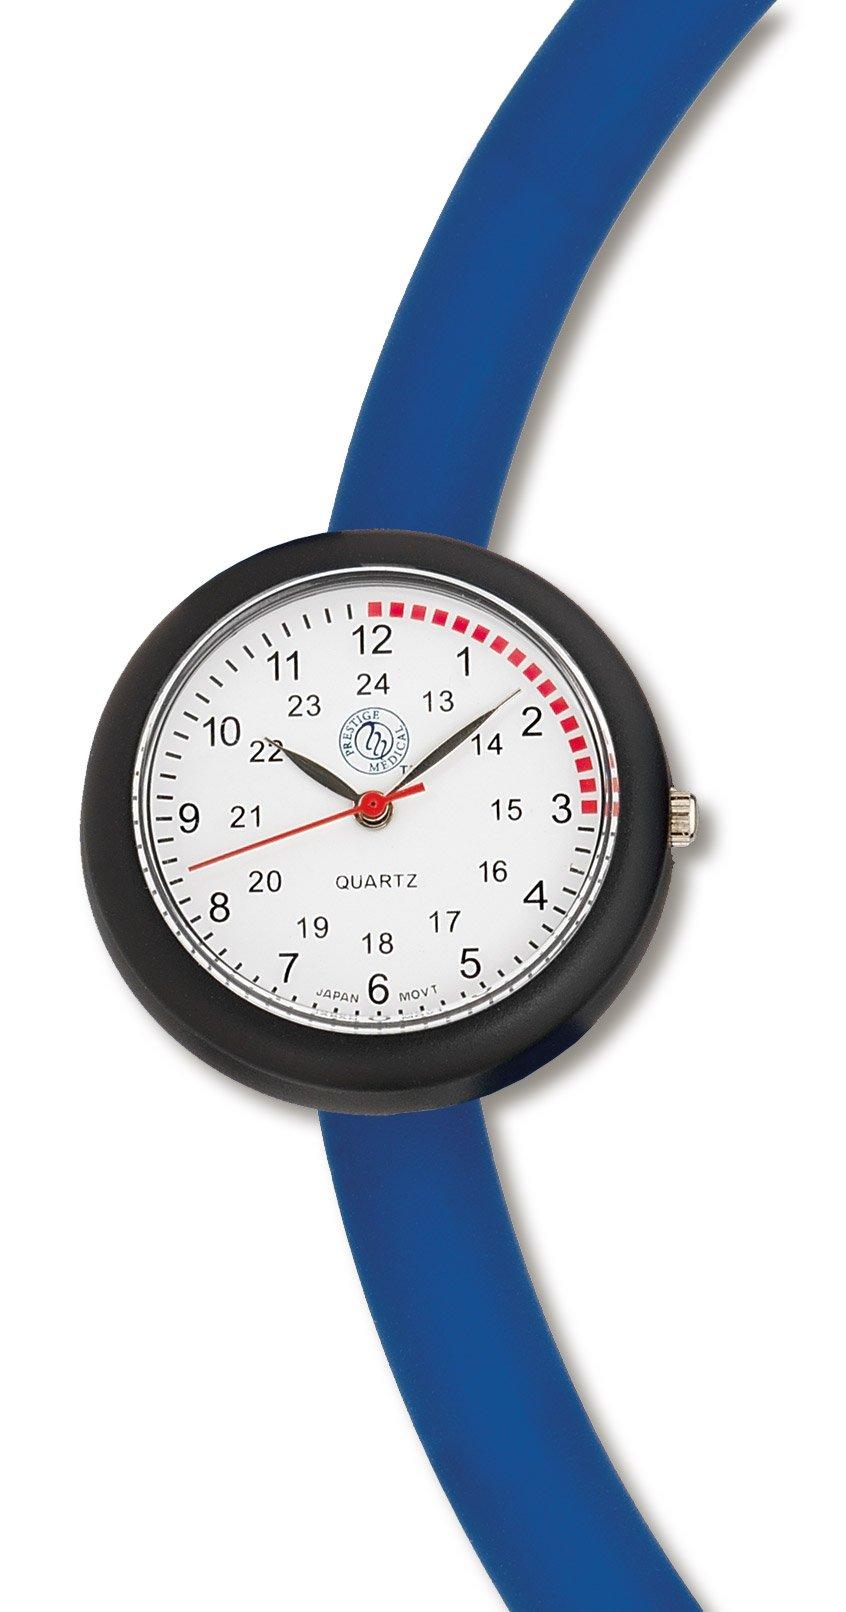 Prestige Medical Analog Stethoscope Watch